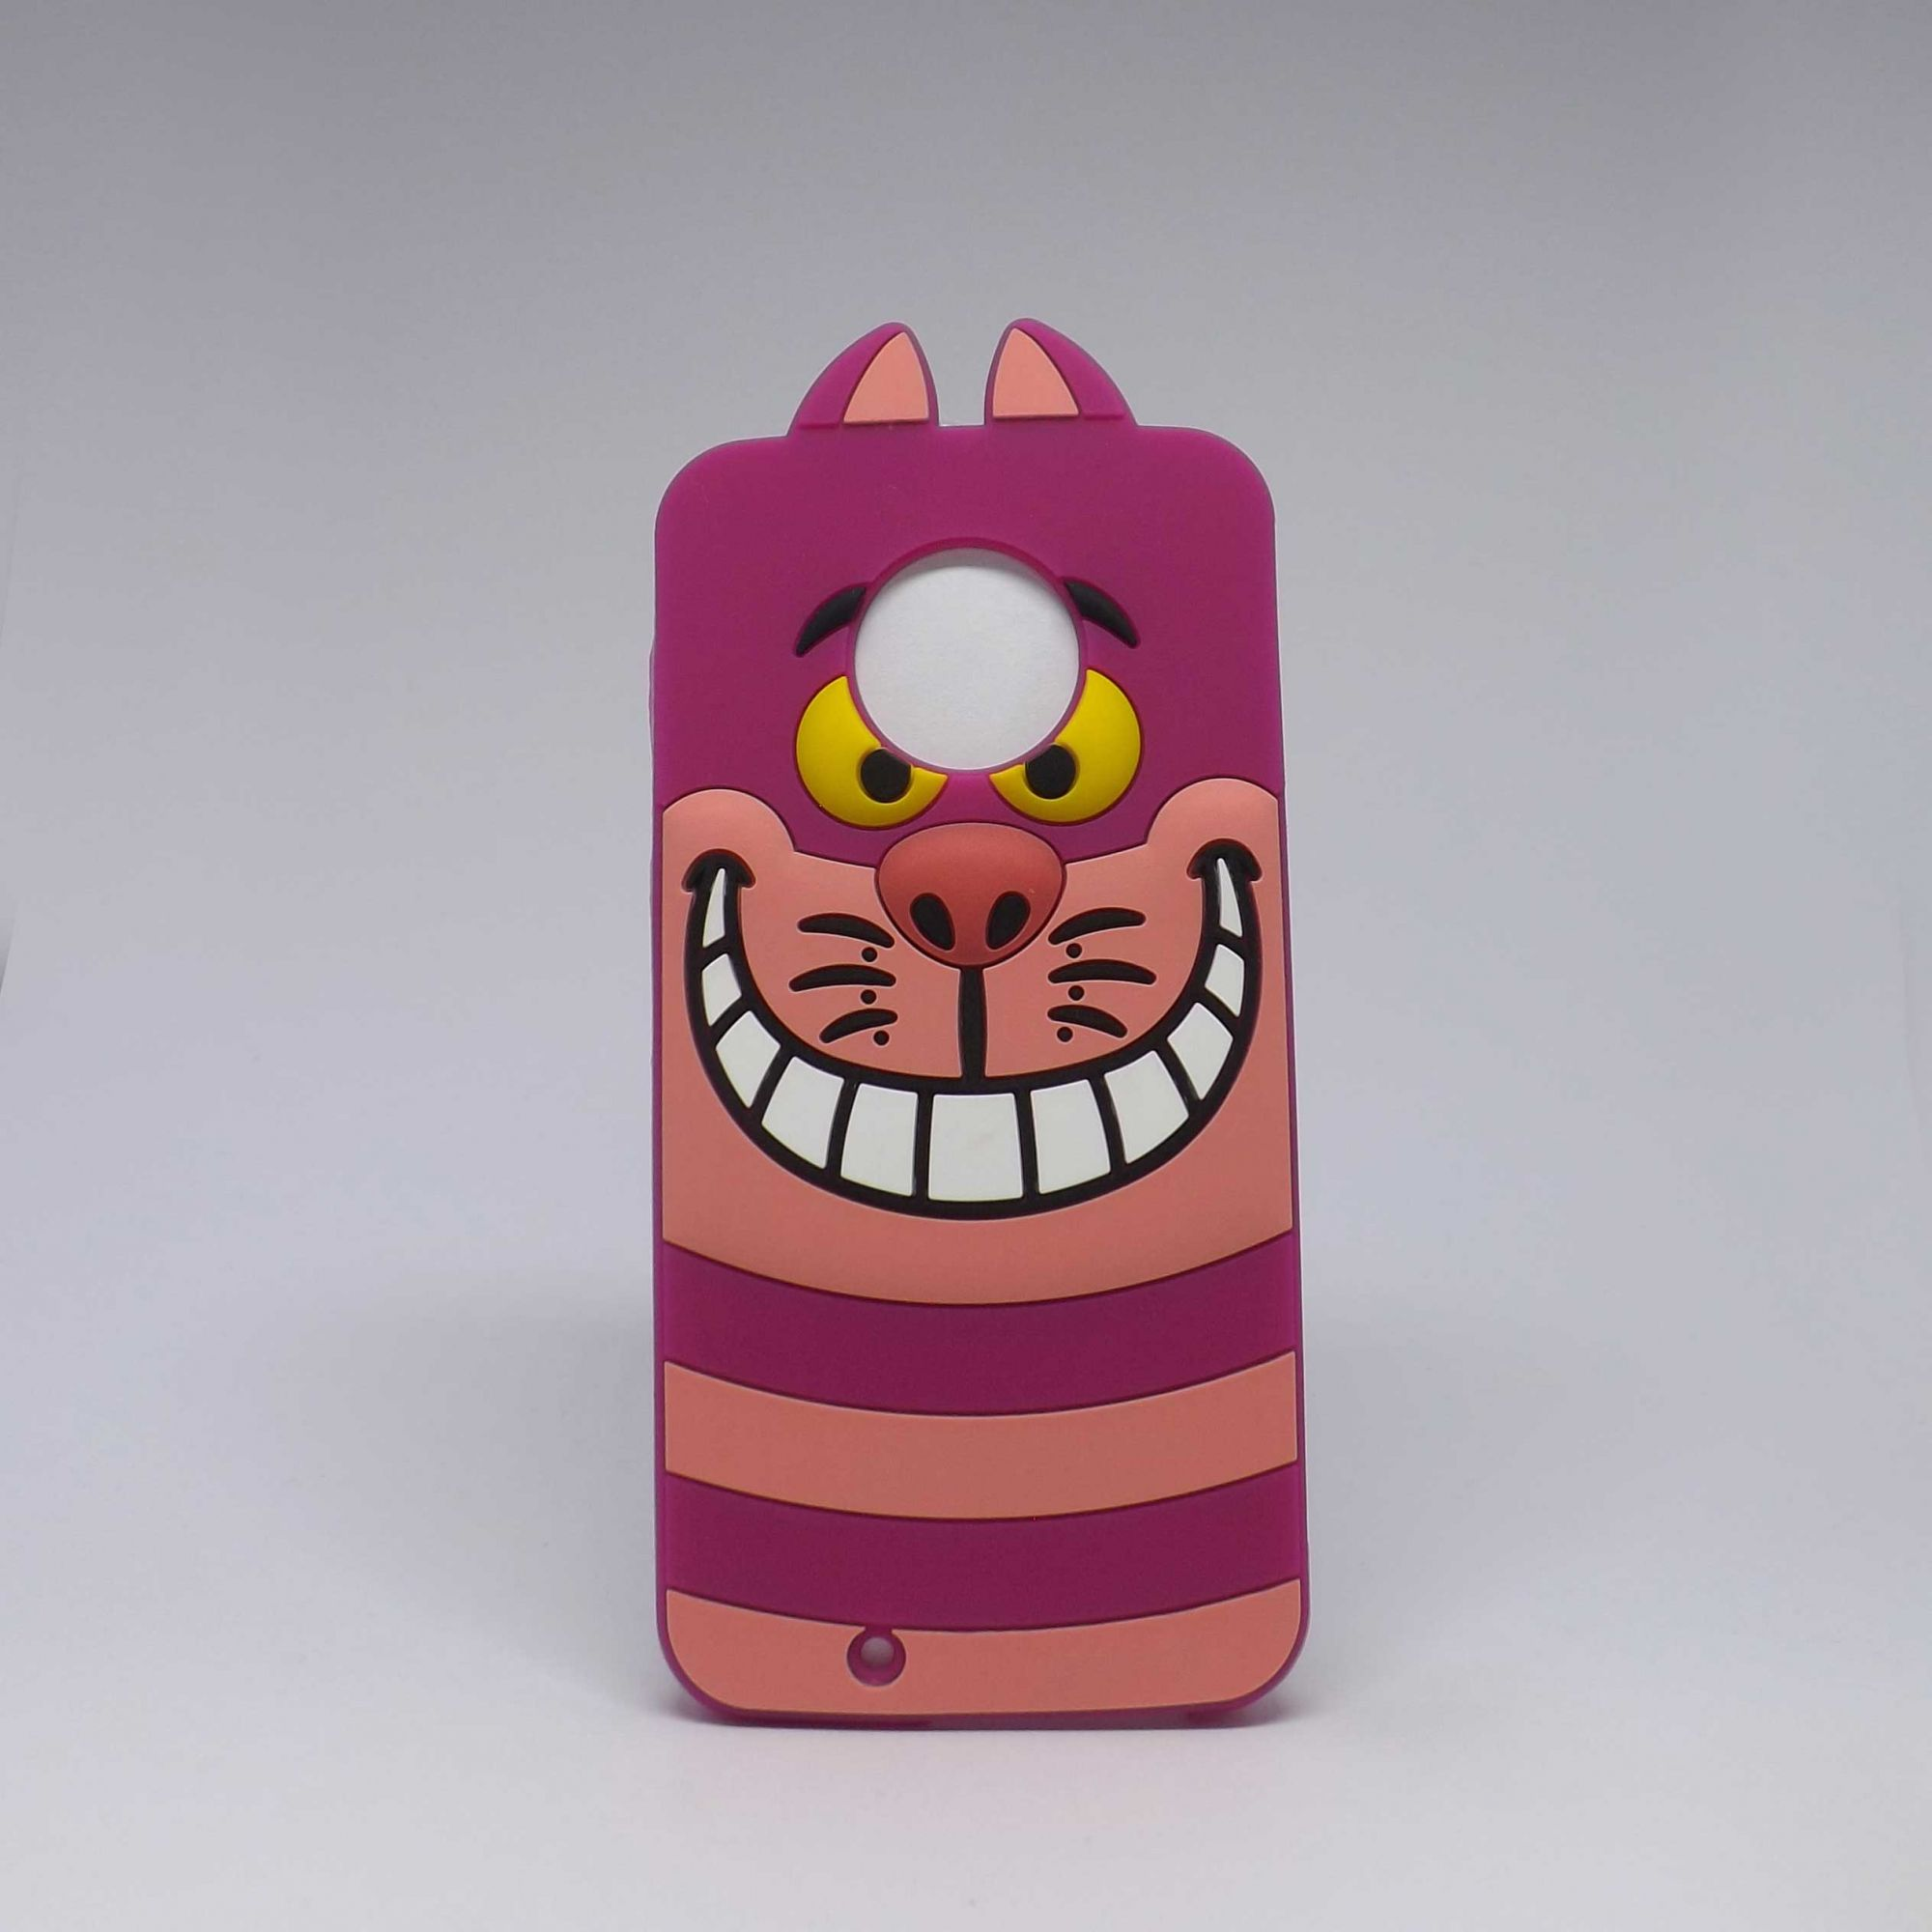 Capa Motorola G6 Personagens - Gato Risonho